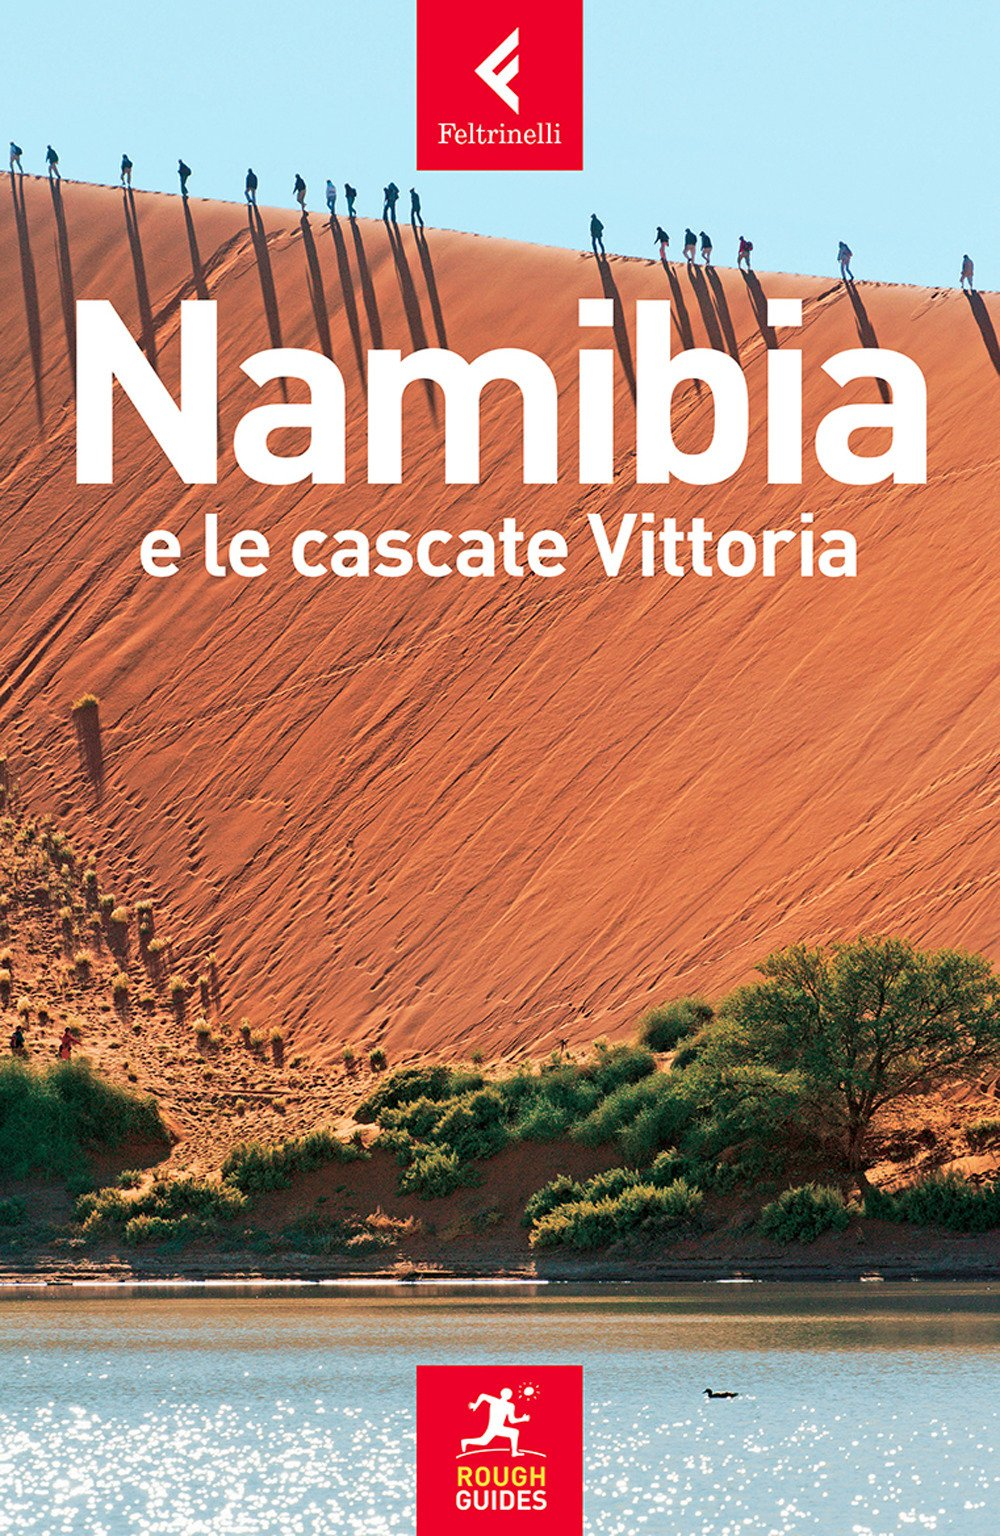 Namibia e le cascate Vittoria (Rough Guides): Amazon.es: Humphreys ...